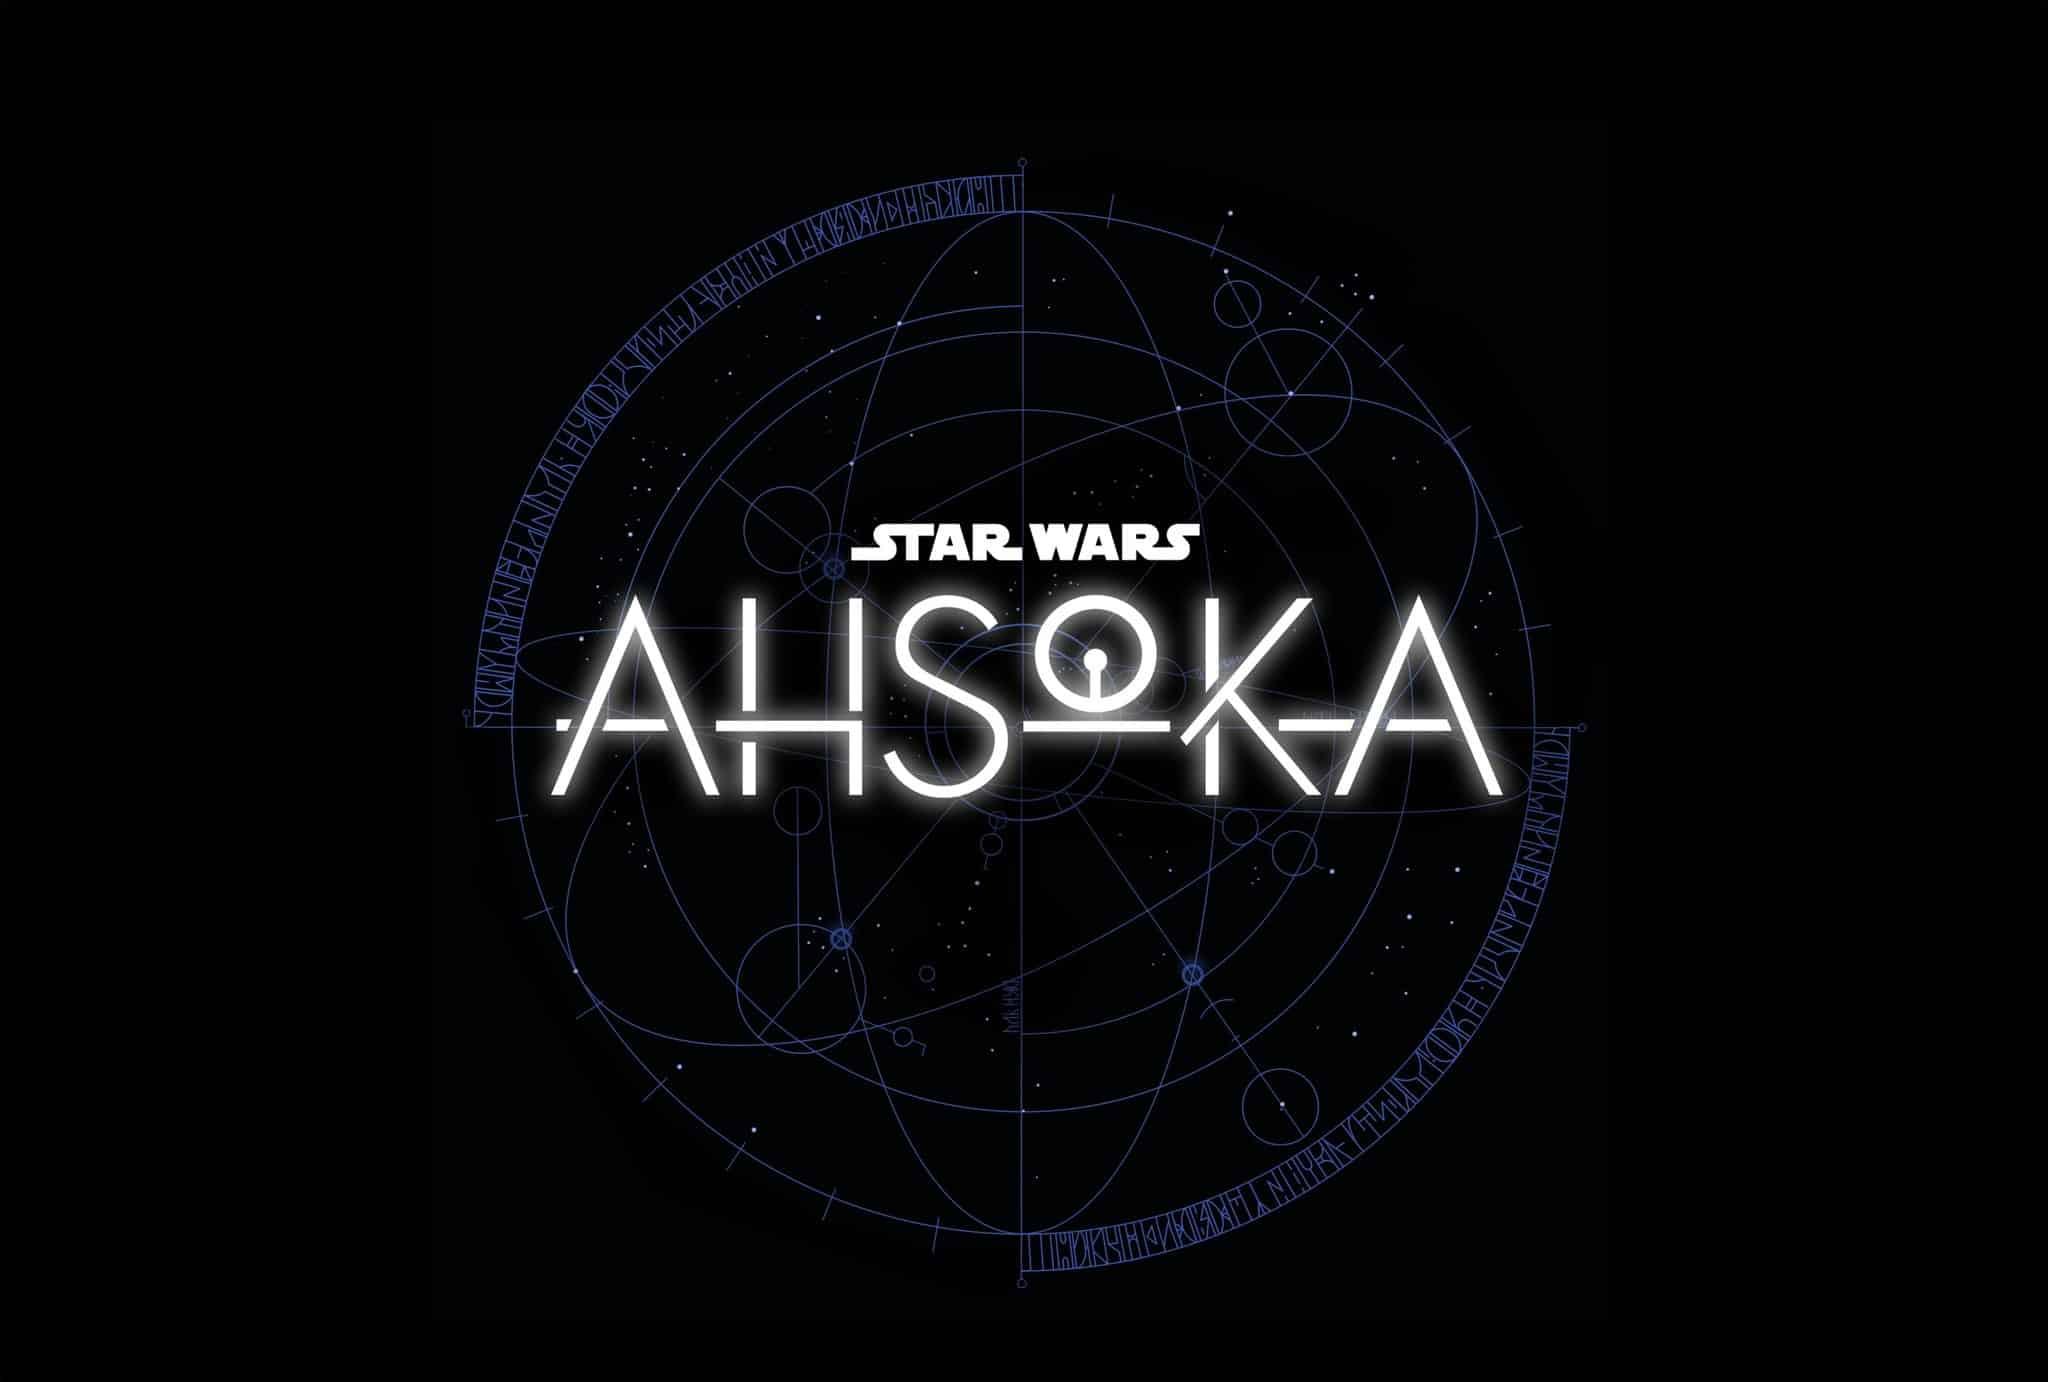 Series de Star Wars Ahsoka